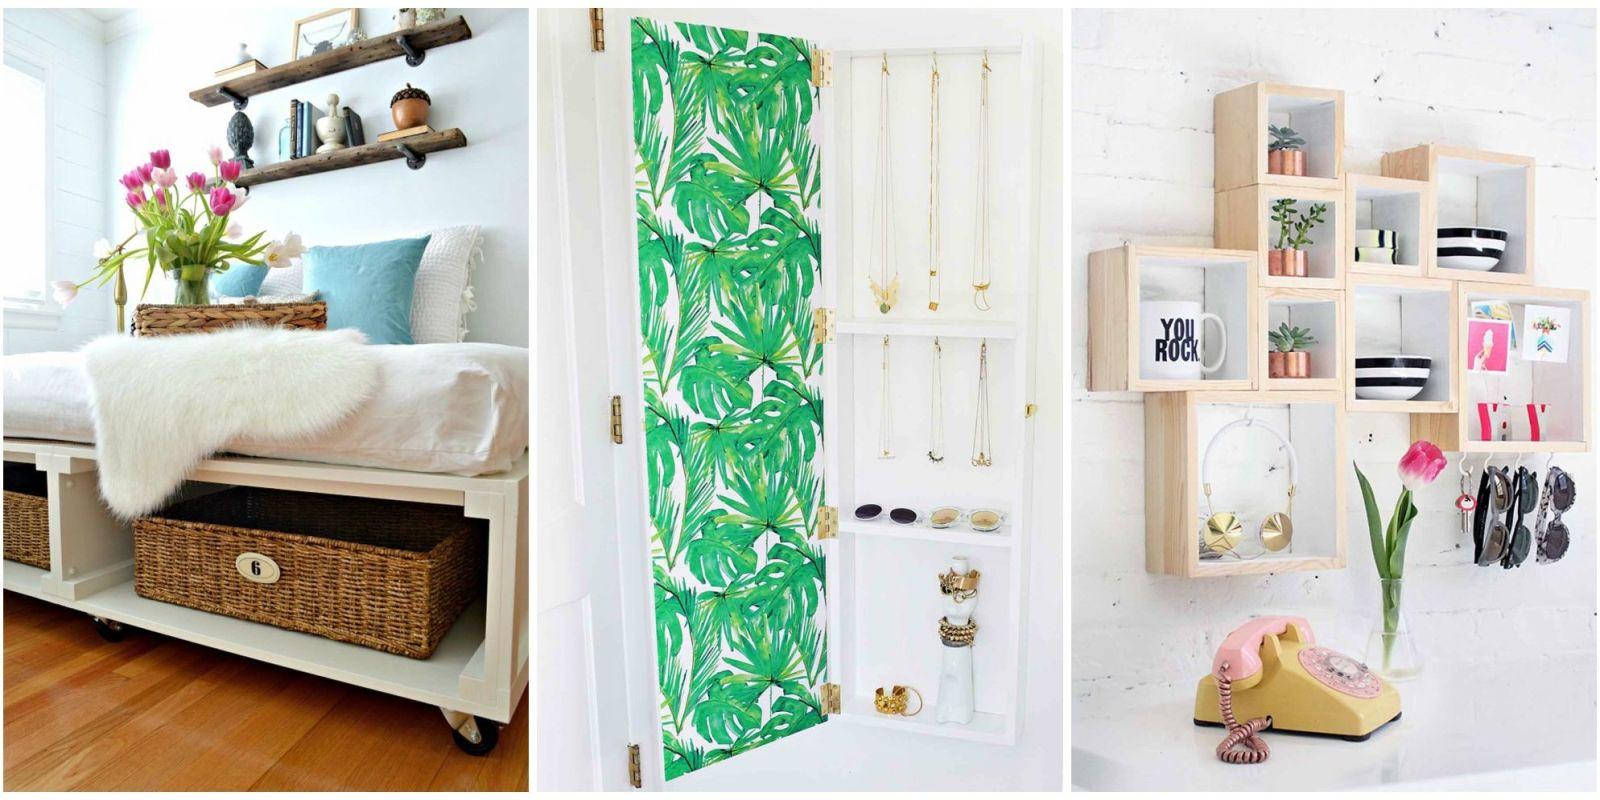 20 Best Bedroom Organization Ideas